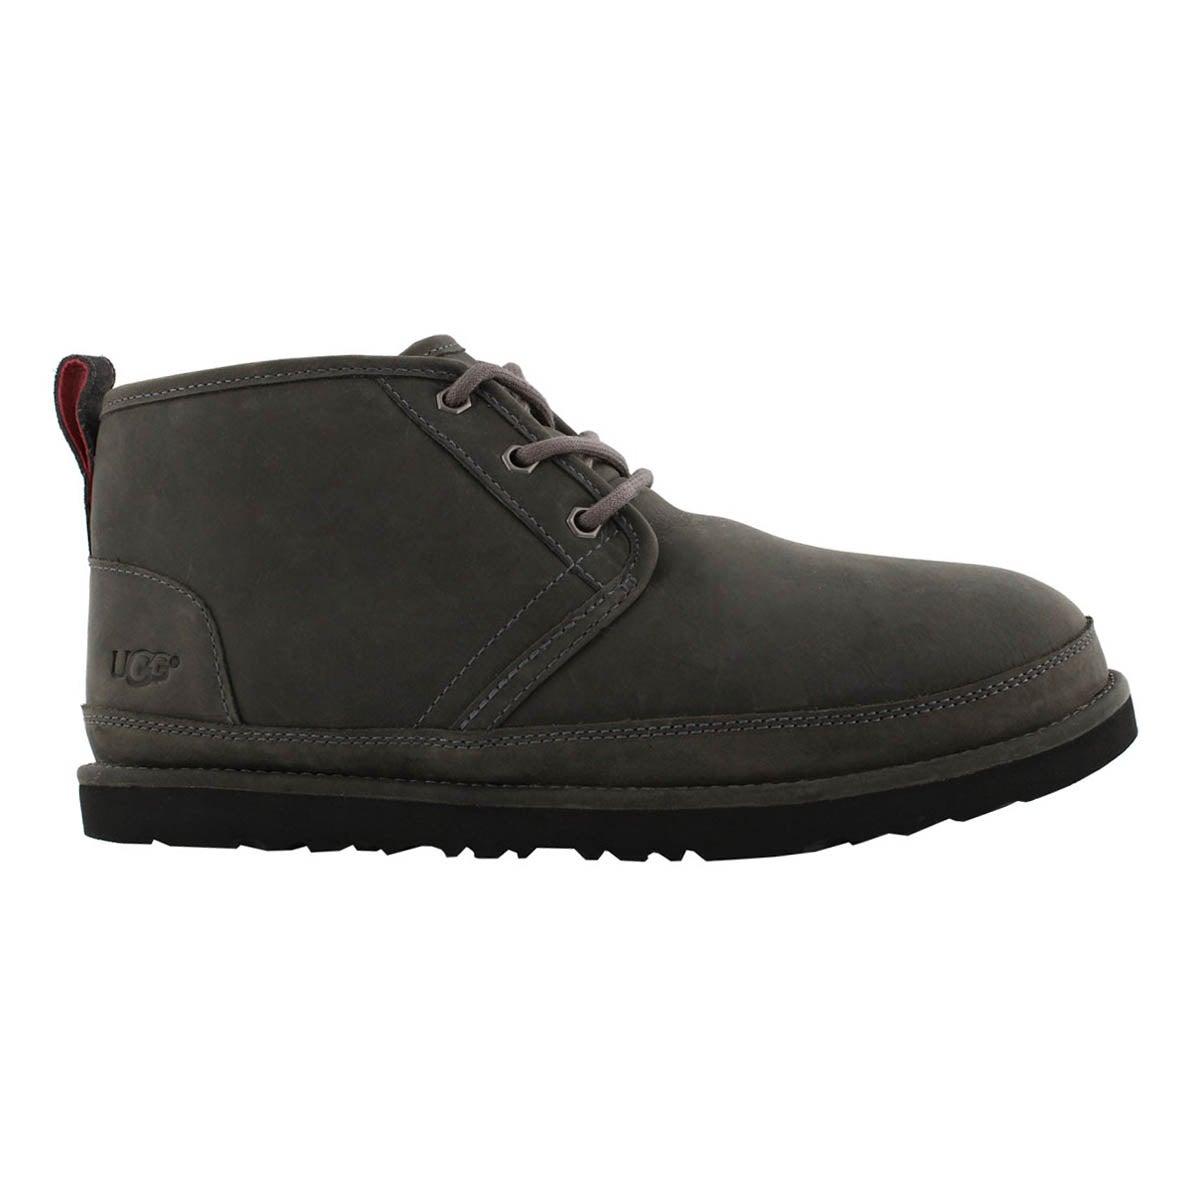 Mns Neumel charcoal wtpf chukka boot